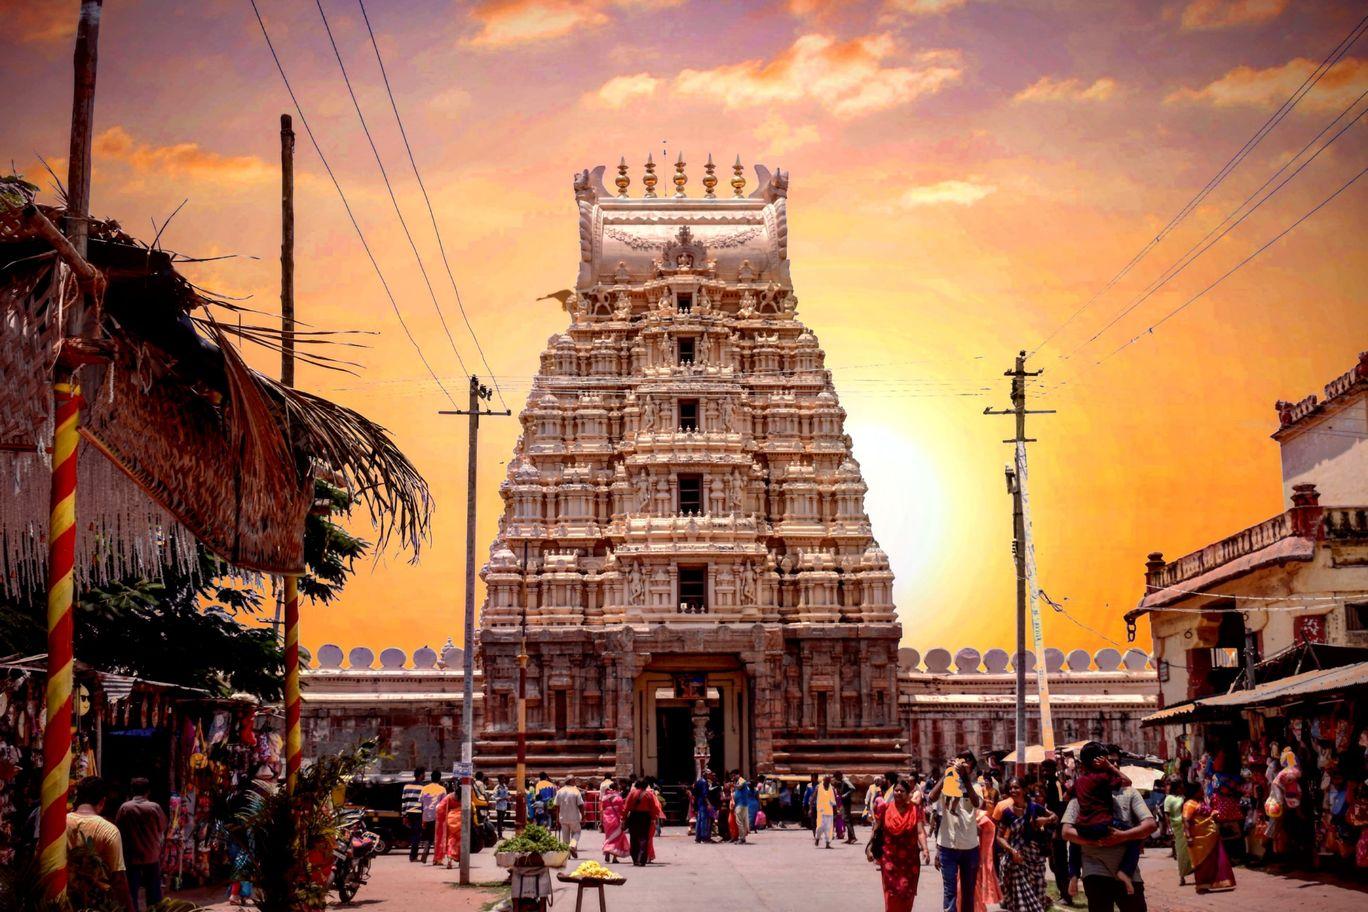 Photo of Ranganathaswamy Temple By Ritik jain